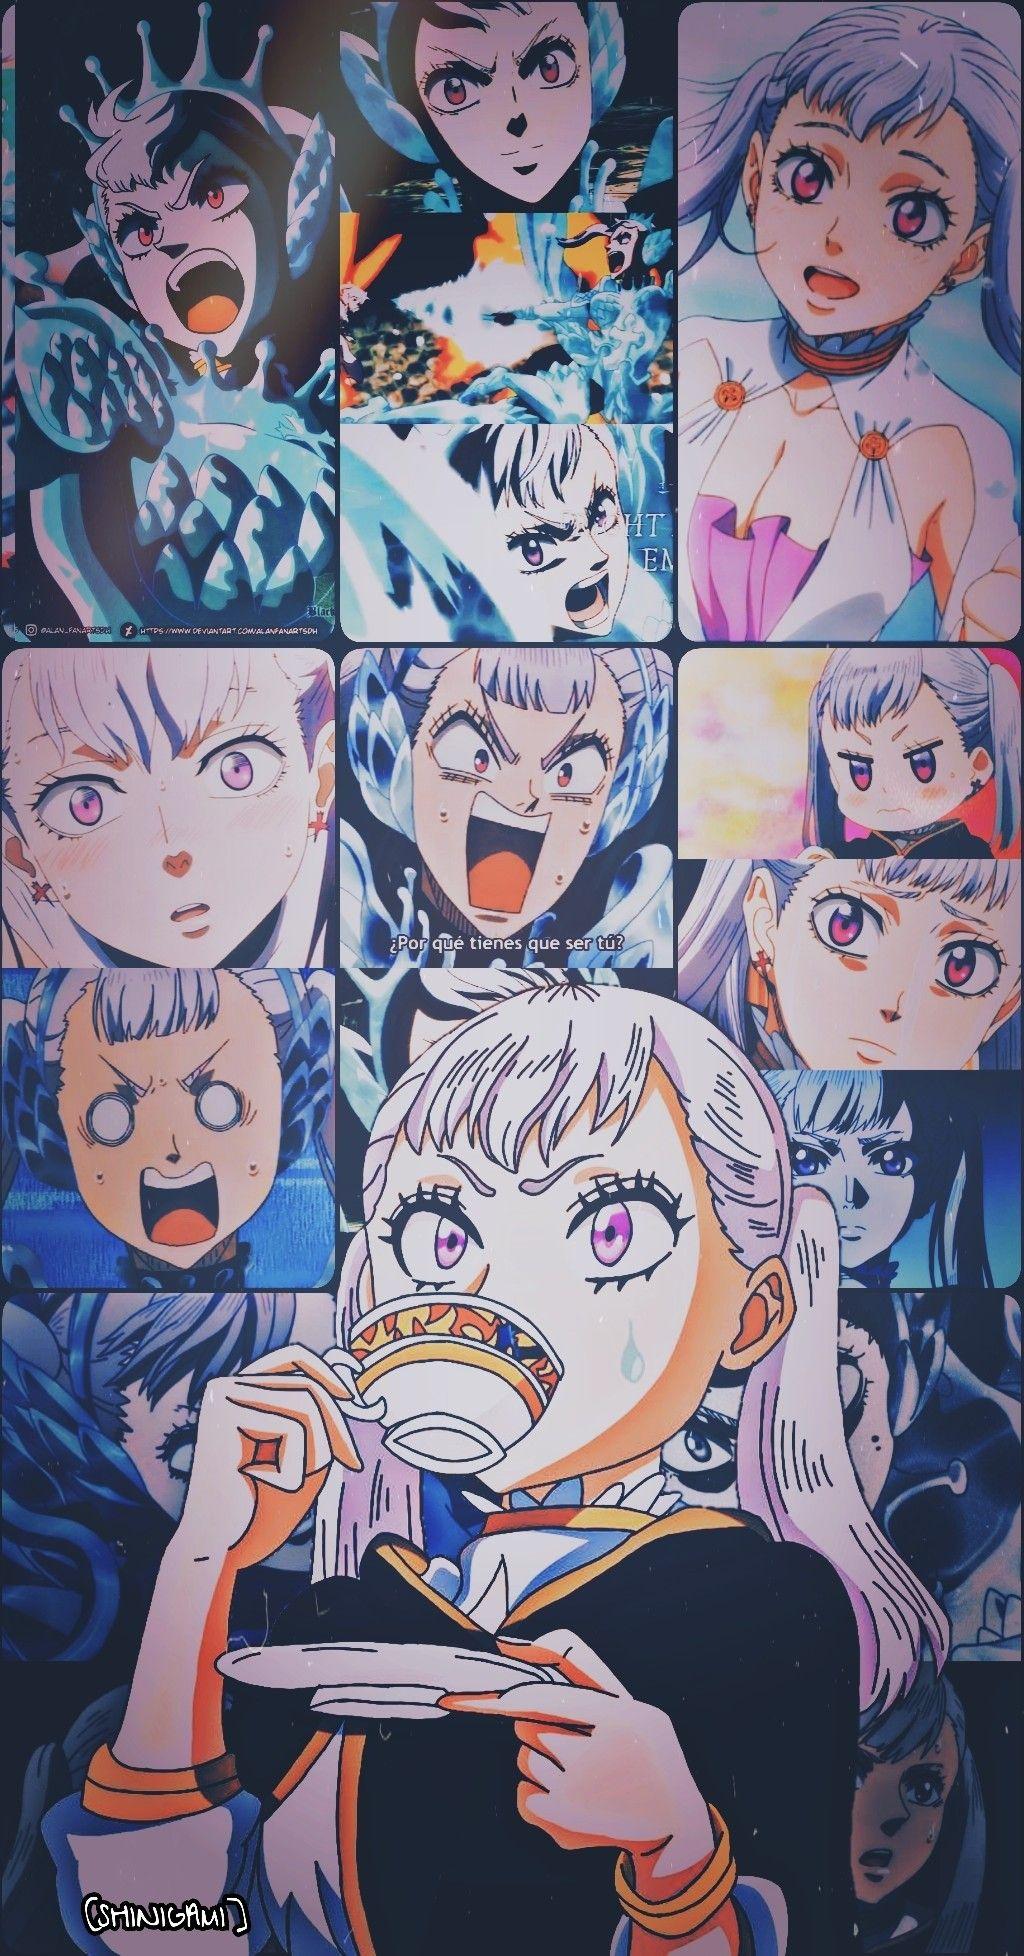 Black Clover Noelle Silva Fondo De Pantalla In 2020 Black Clover Anime Black Clover Manga Anime Wallpaper